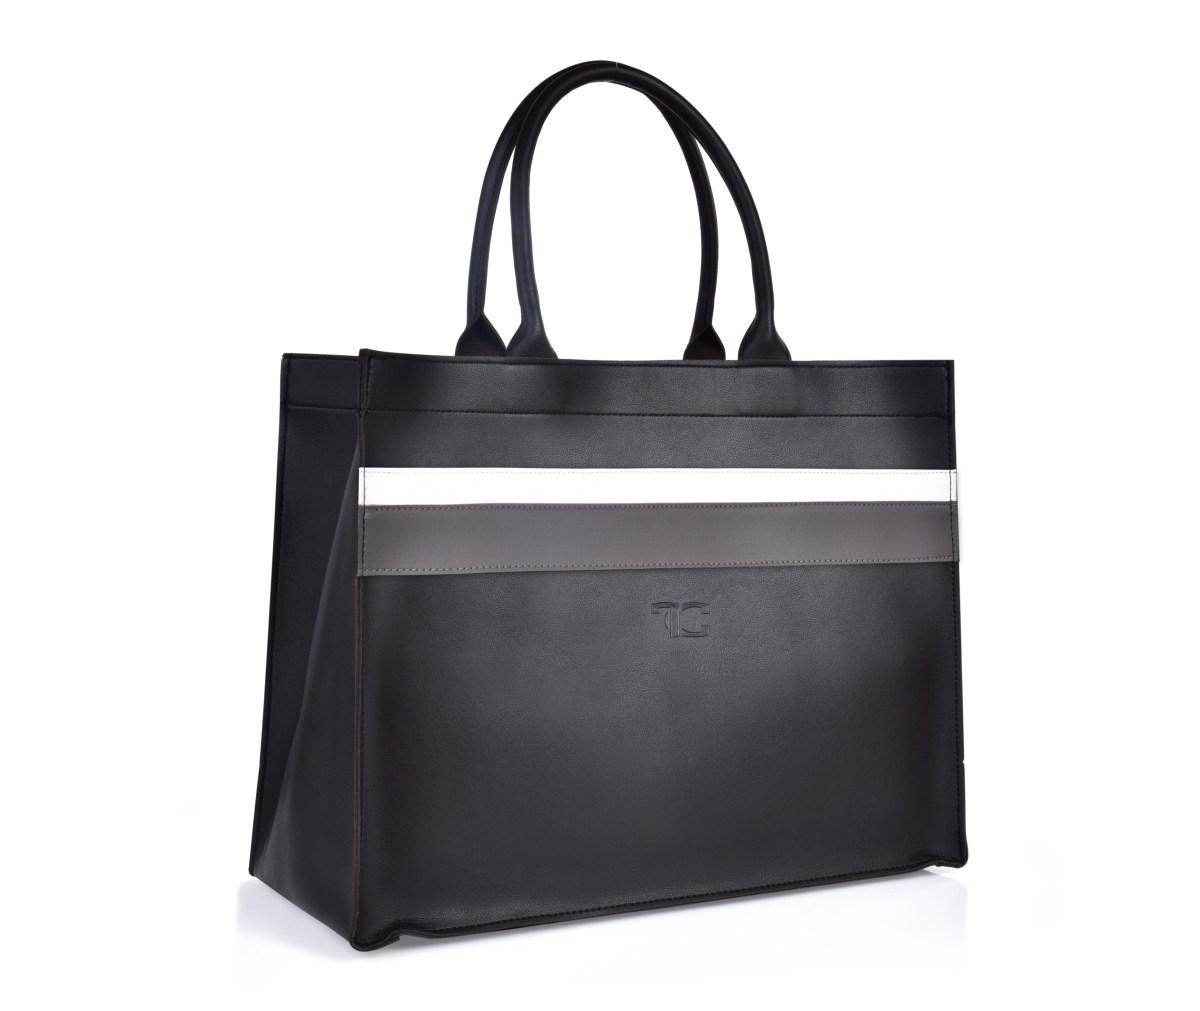 FC SHOPPER BAG elegancka torba/torebka w paski